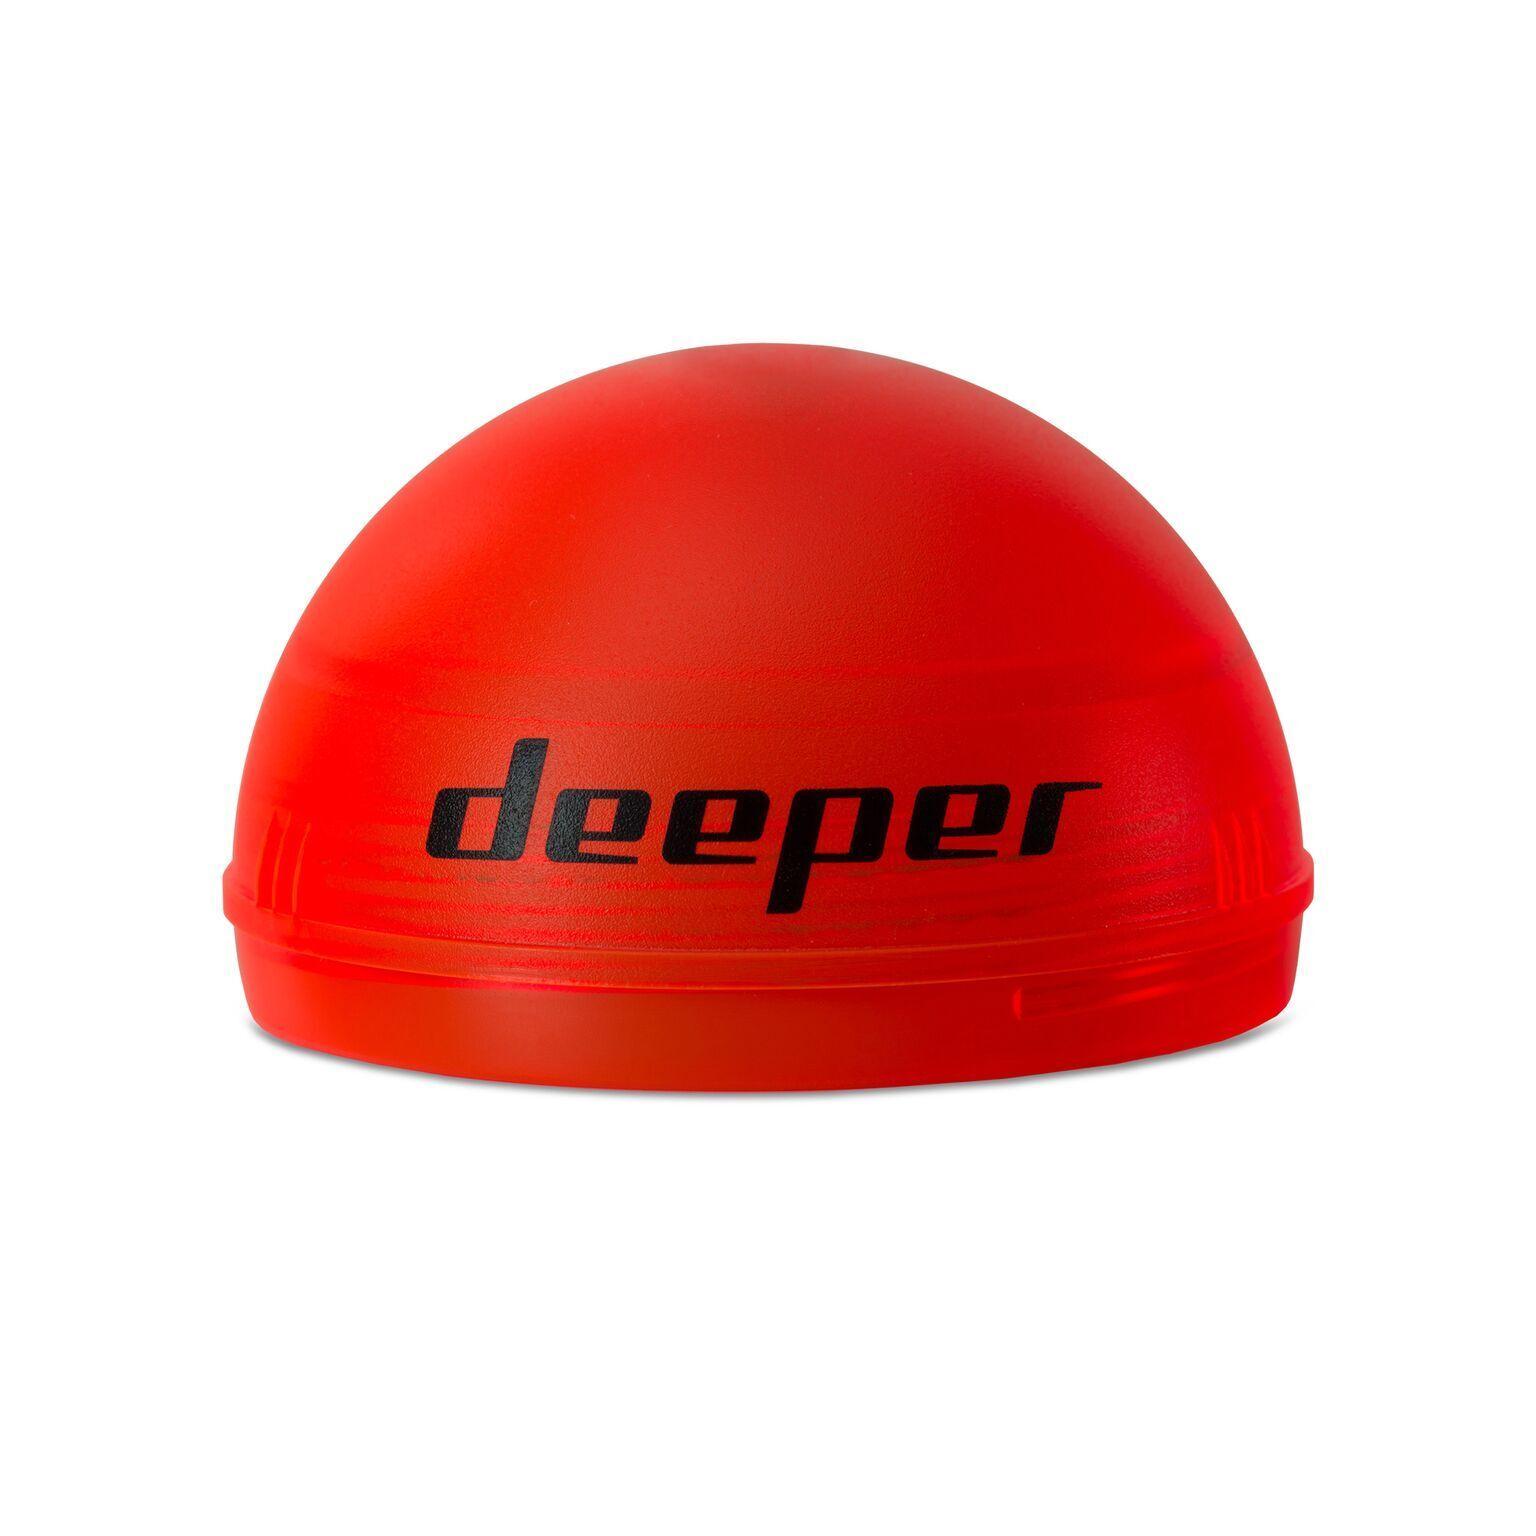 Deeper PRO+ PLUS BUNDLE WIFI GPS +Gerber Zange +Handy +Handy +Handy Halterung +NightCover Echo f48e6e